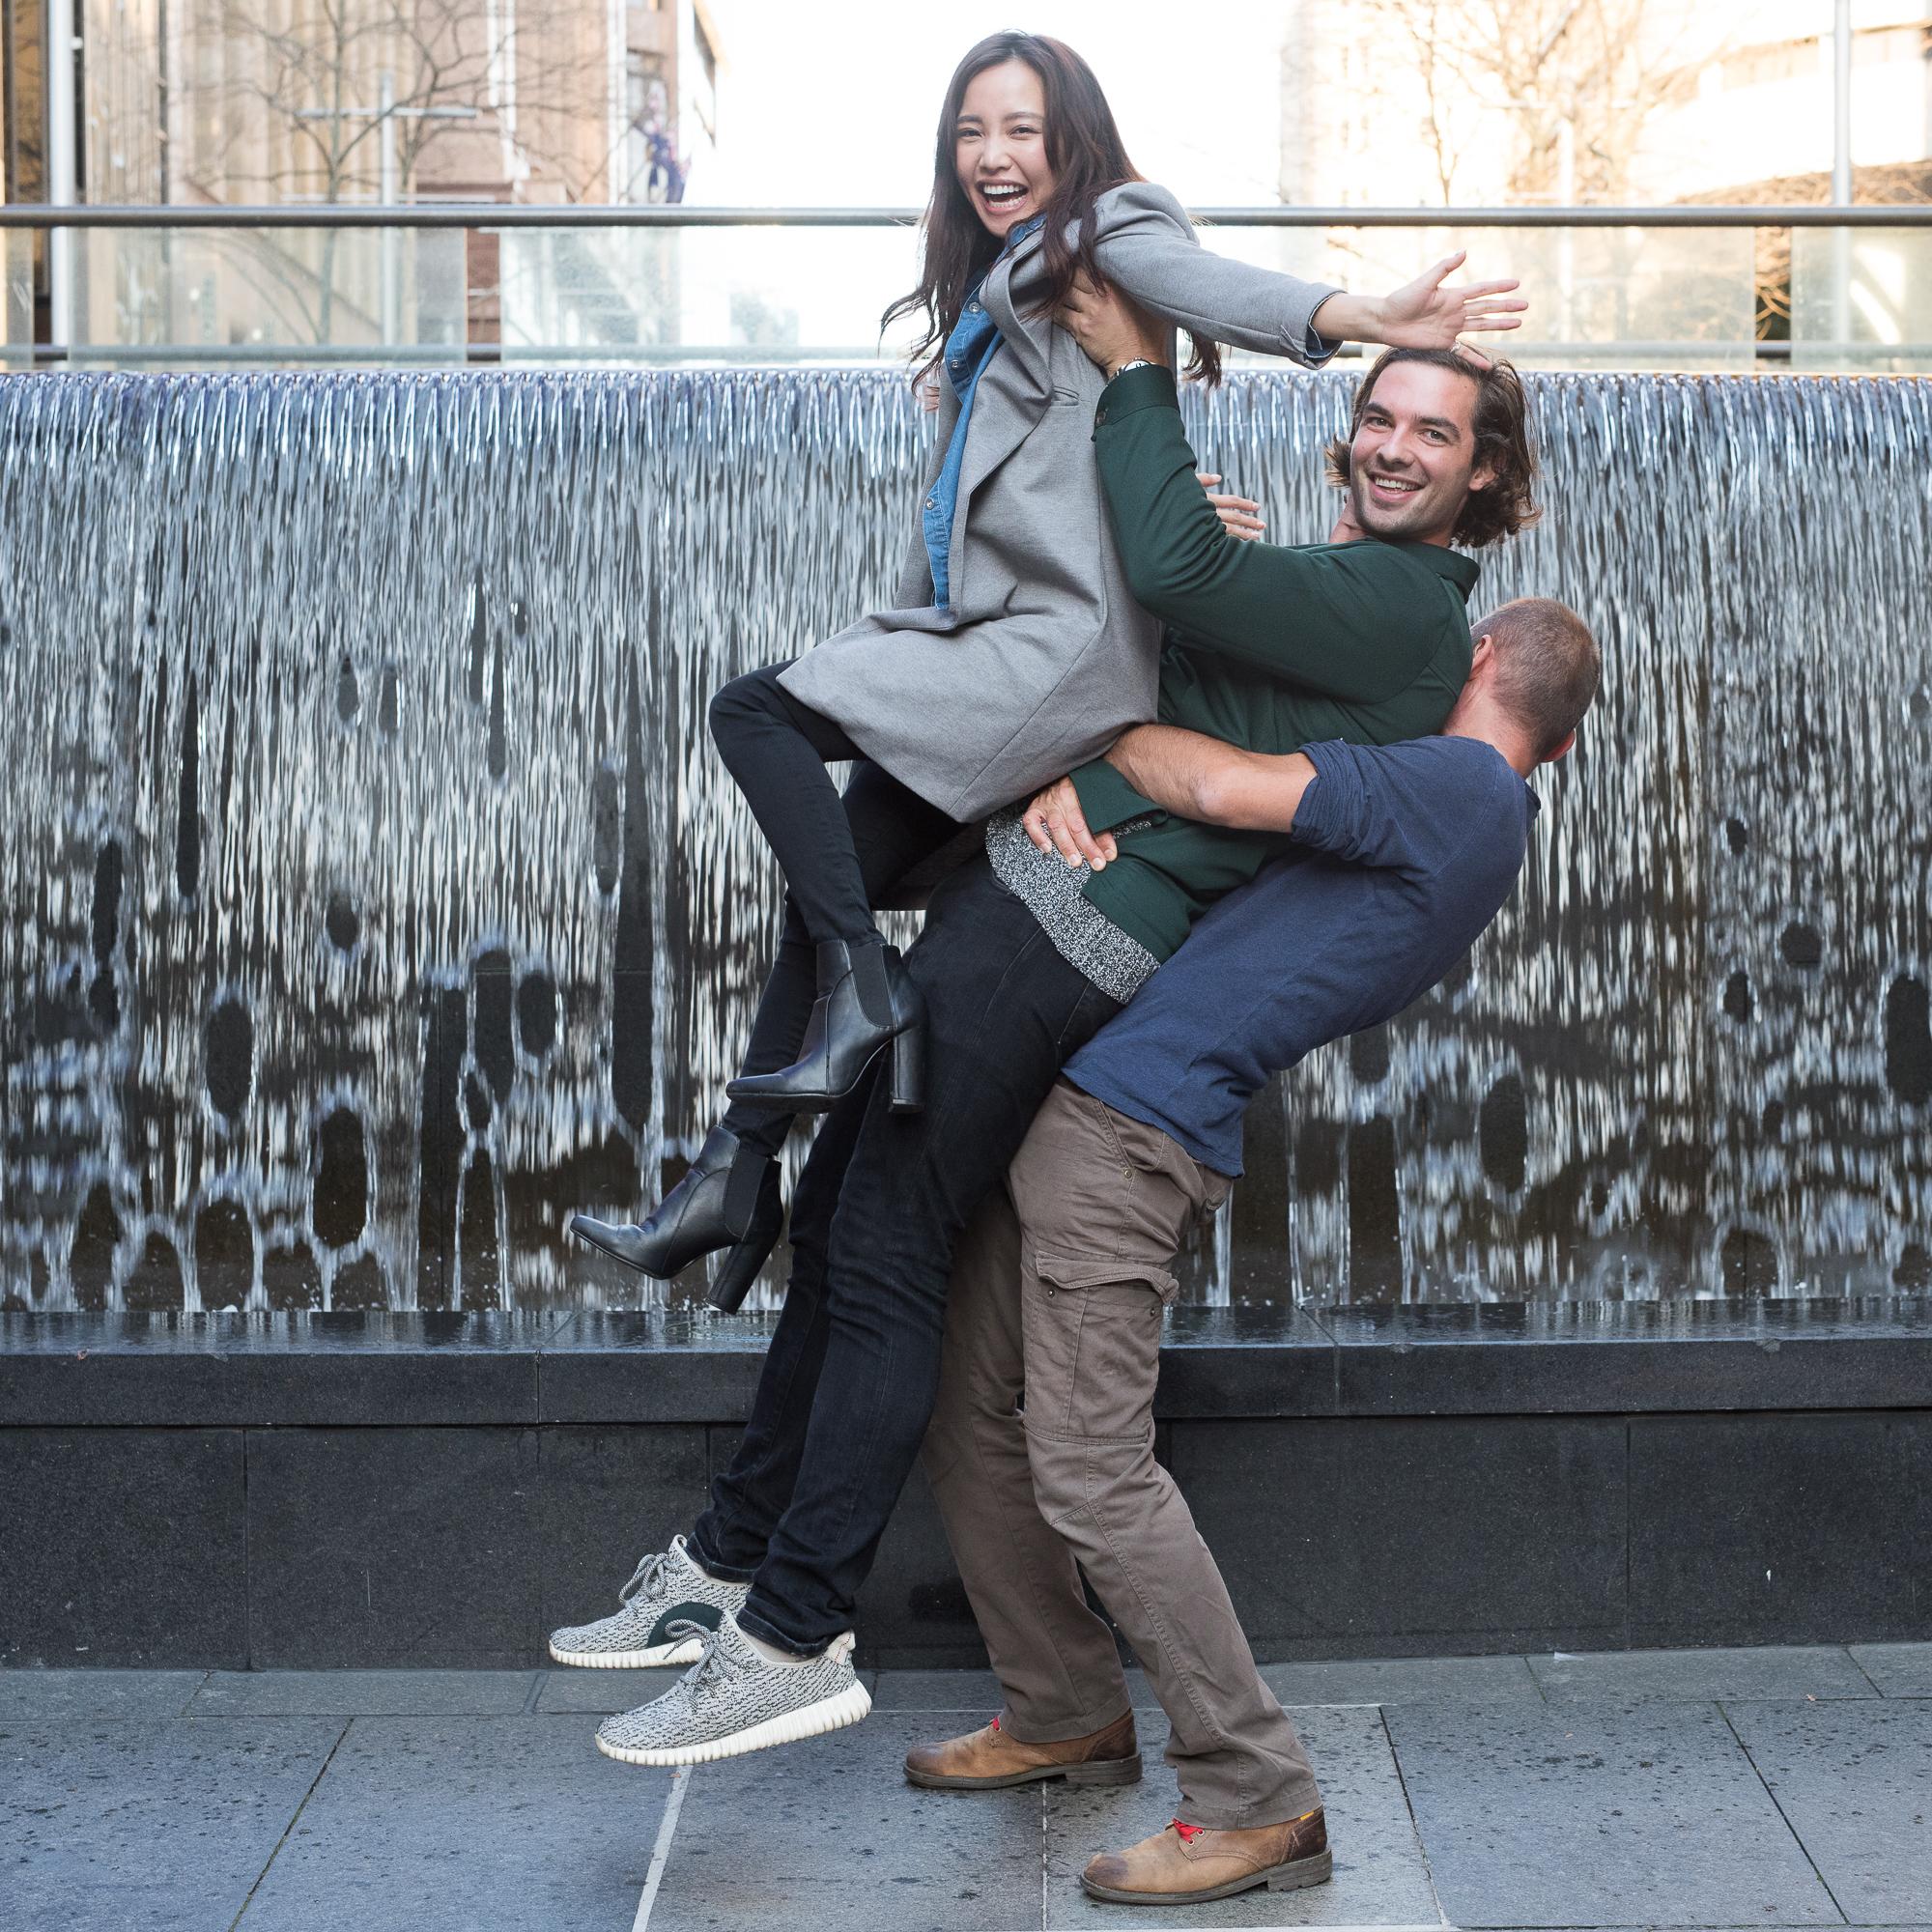 Martin Place Sydney - Piling up